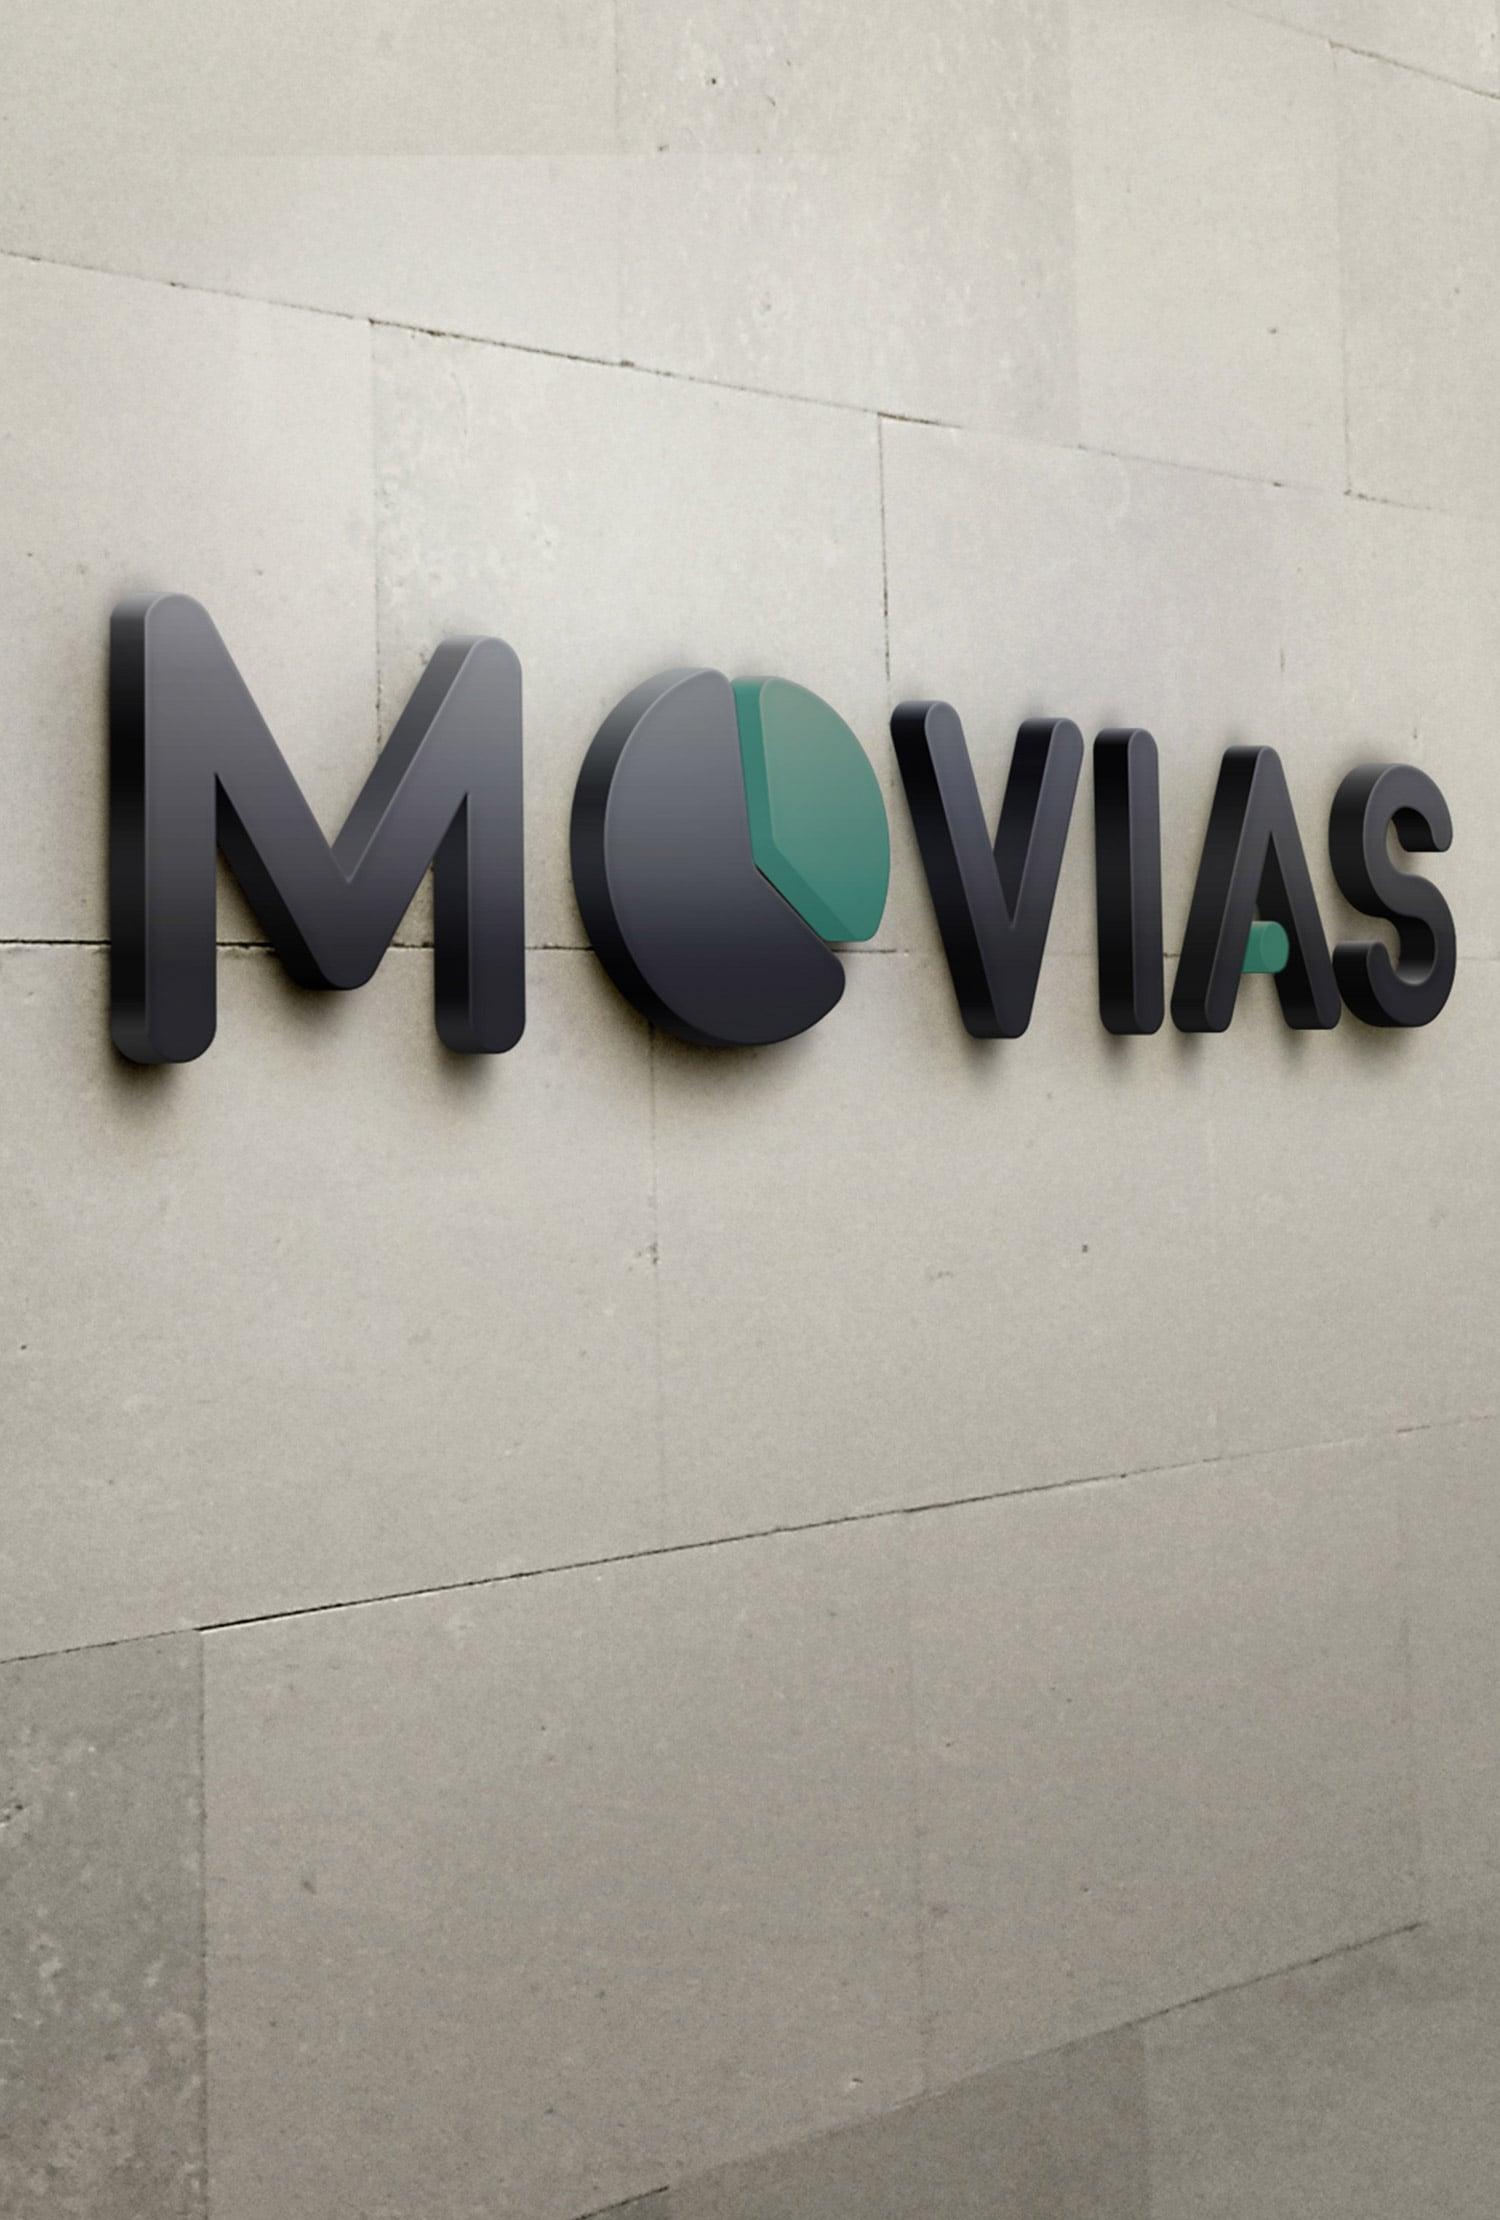 movias full branding wall sign